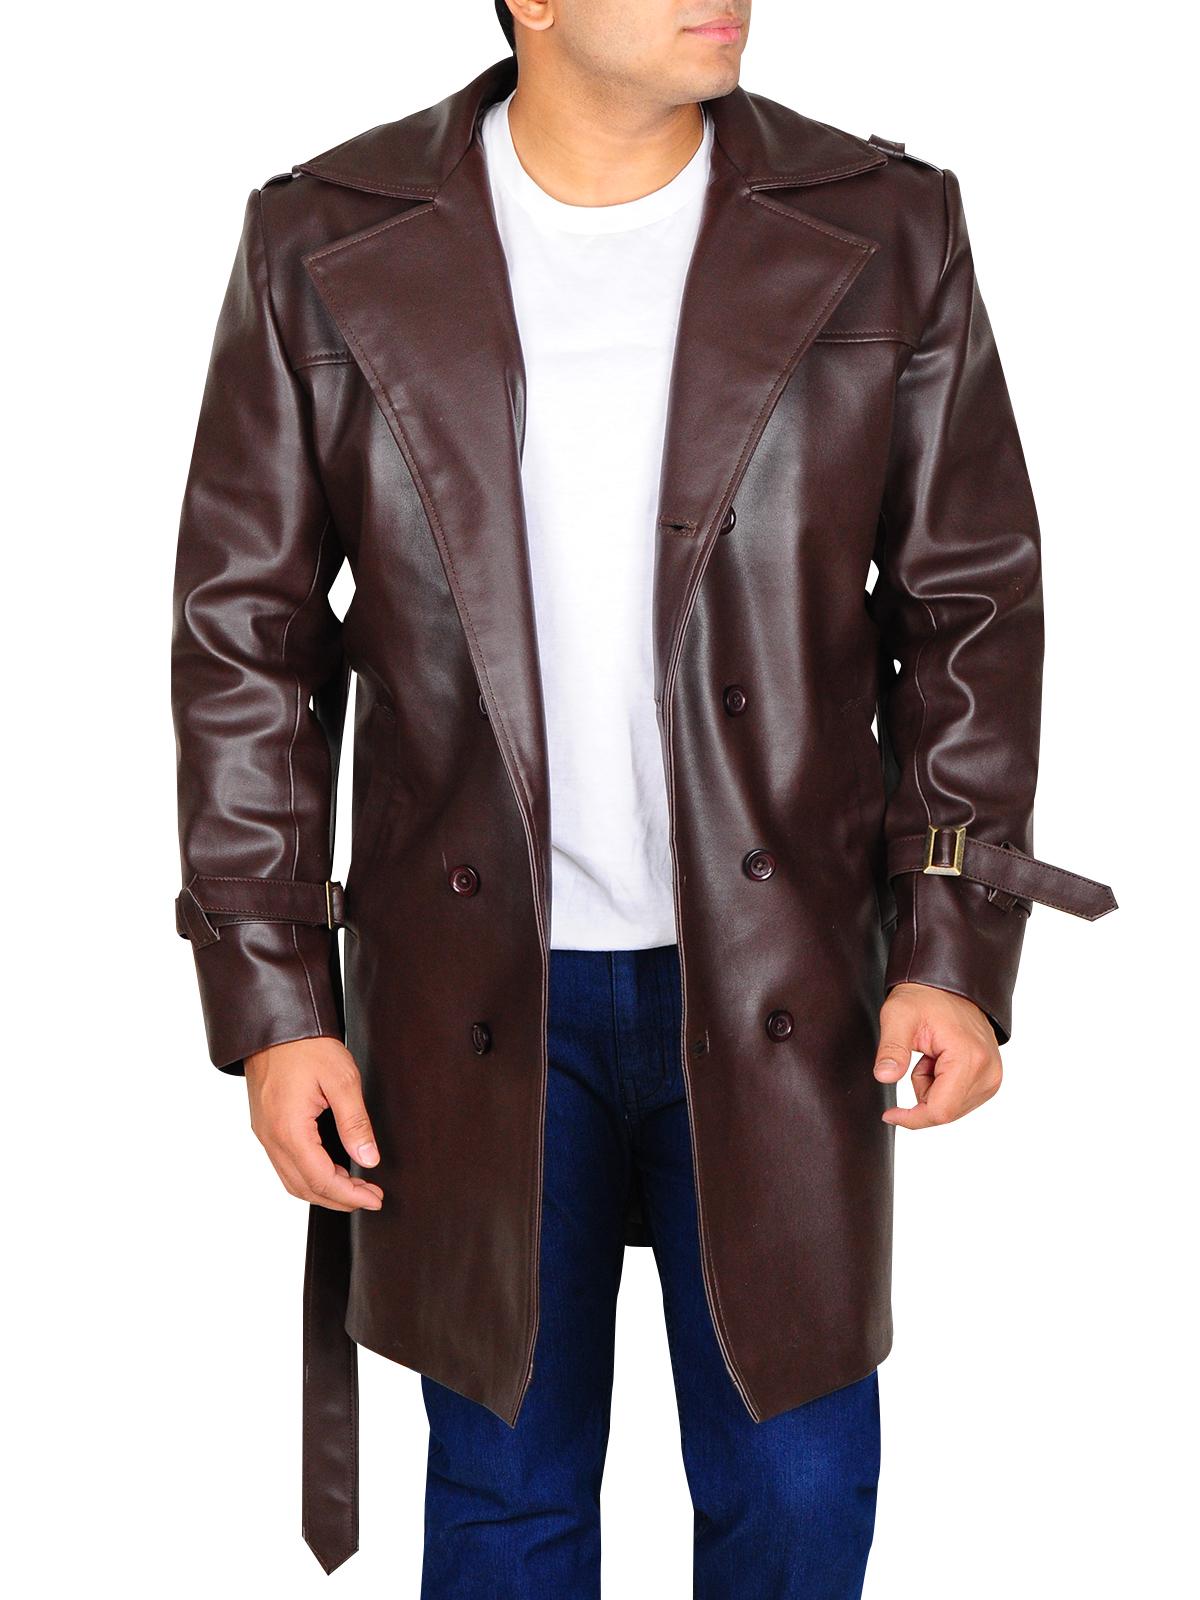 Watchmen Brown Lapel Collar Trench Jacket   Men Jackets   MauveTree